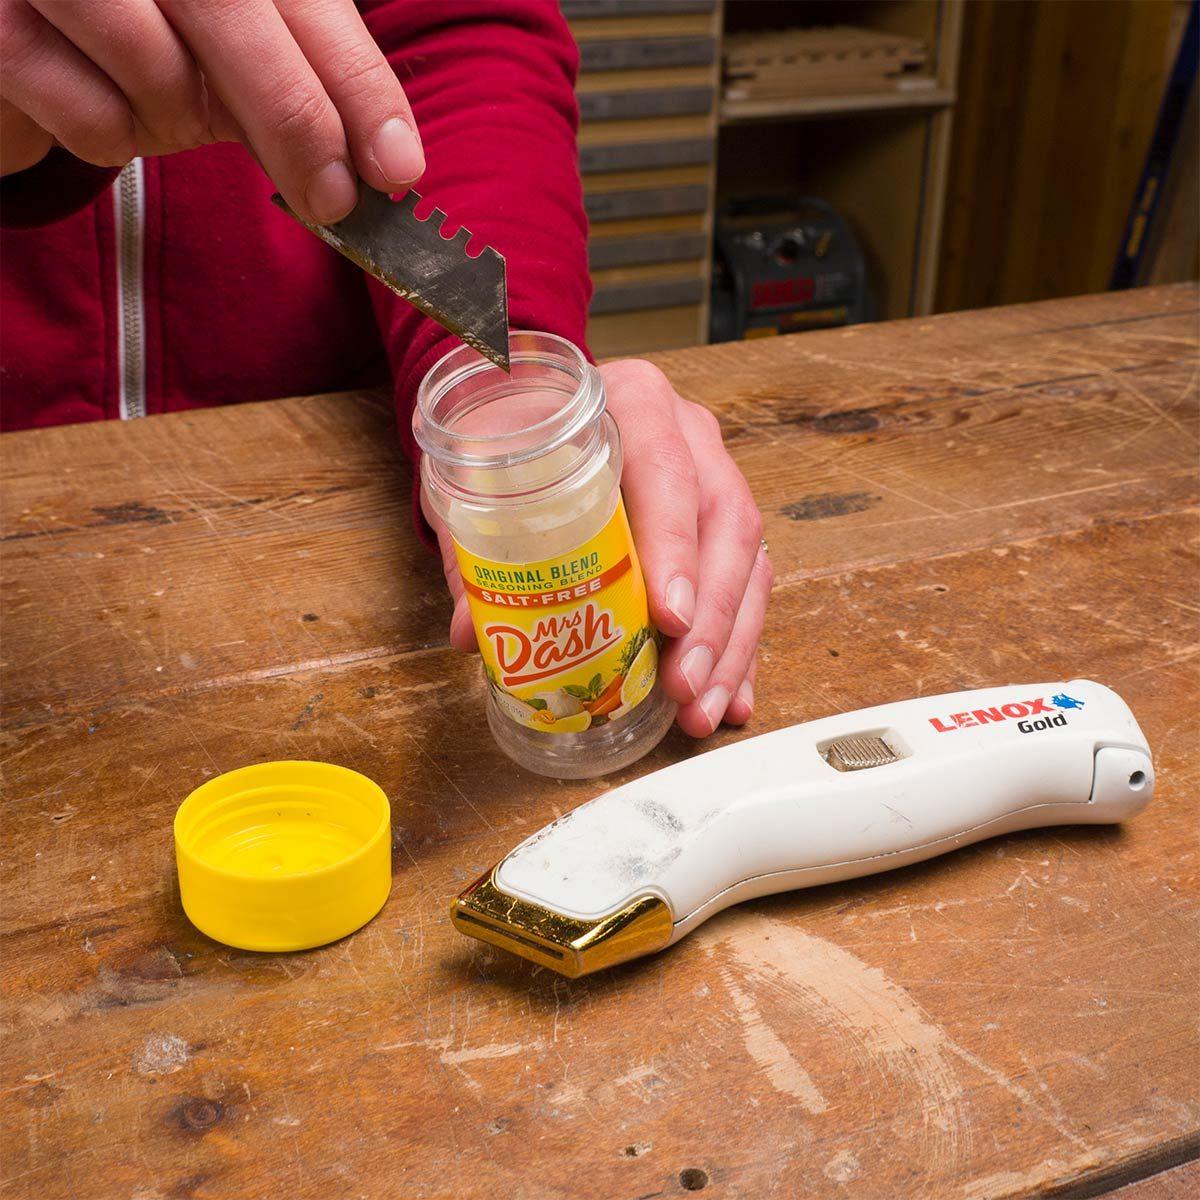 Safer Blade Disposal